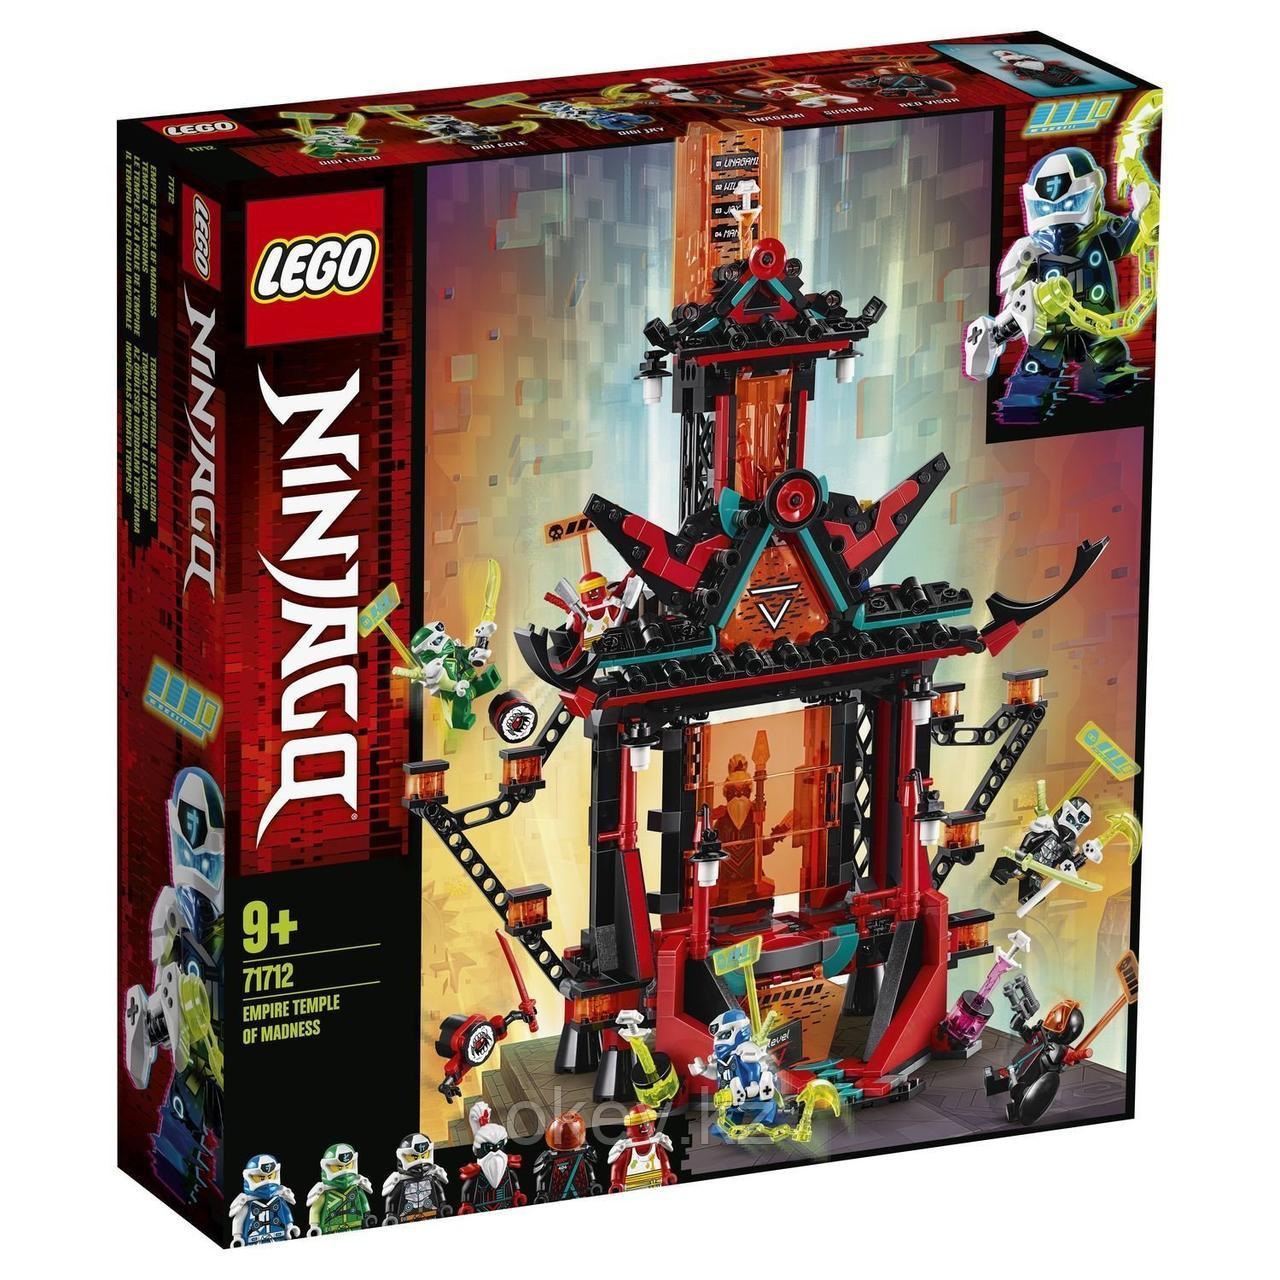 LEGO Ninjago: Императорский храм Безумия 71712